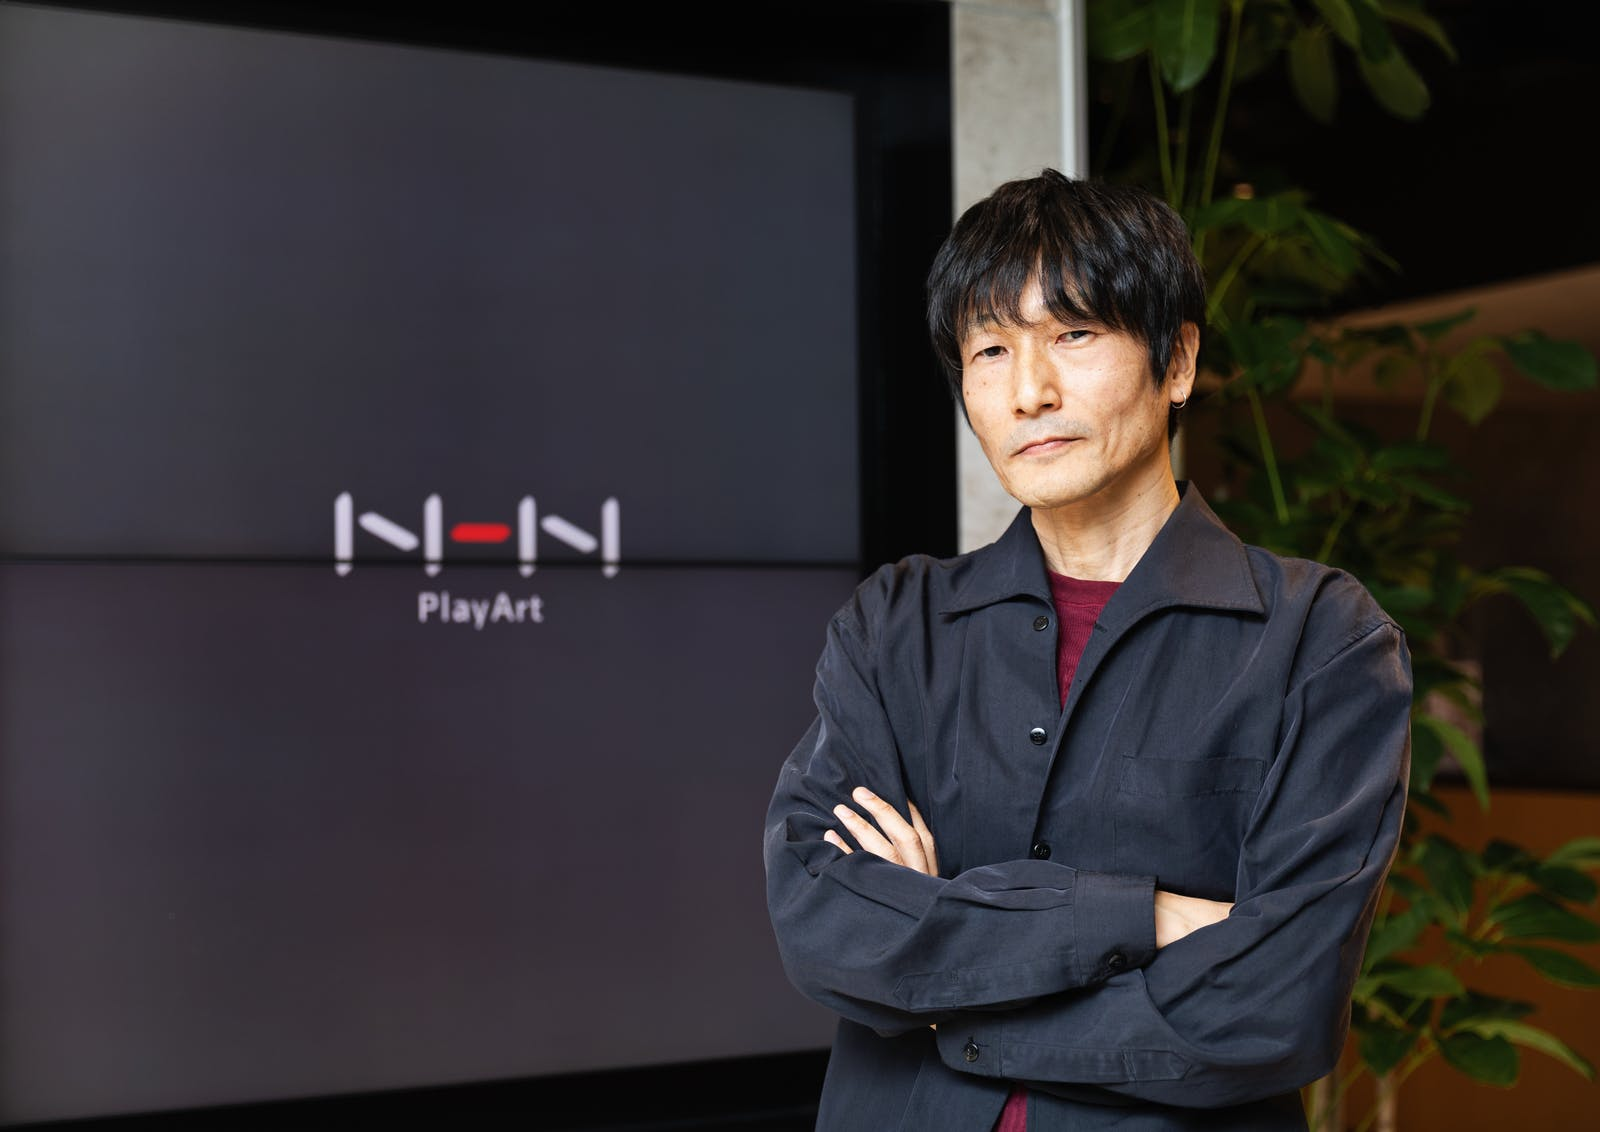 NHN PlayArt 株式会社のアイキャッチ画像